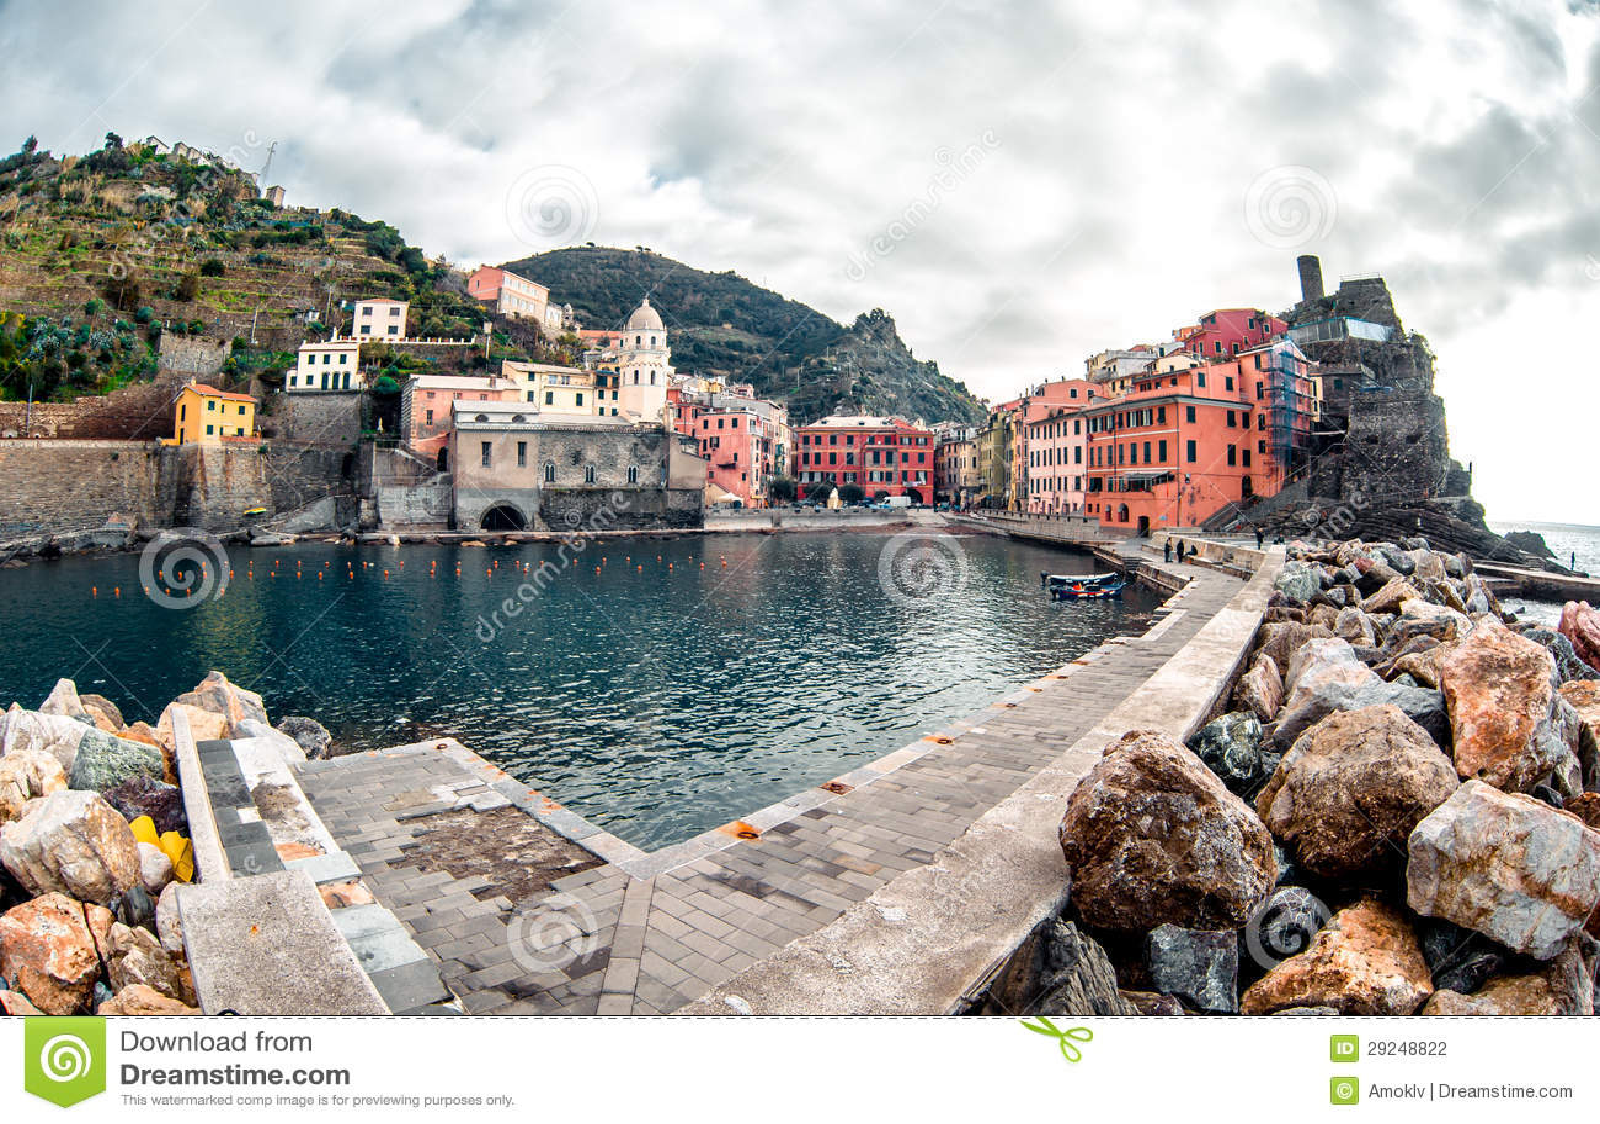 Download Vista de Vernazza foto de stock. Imagem de histórico - 29248822